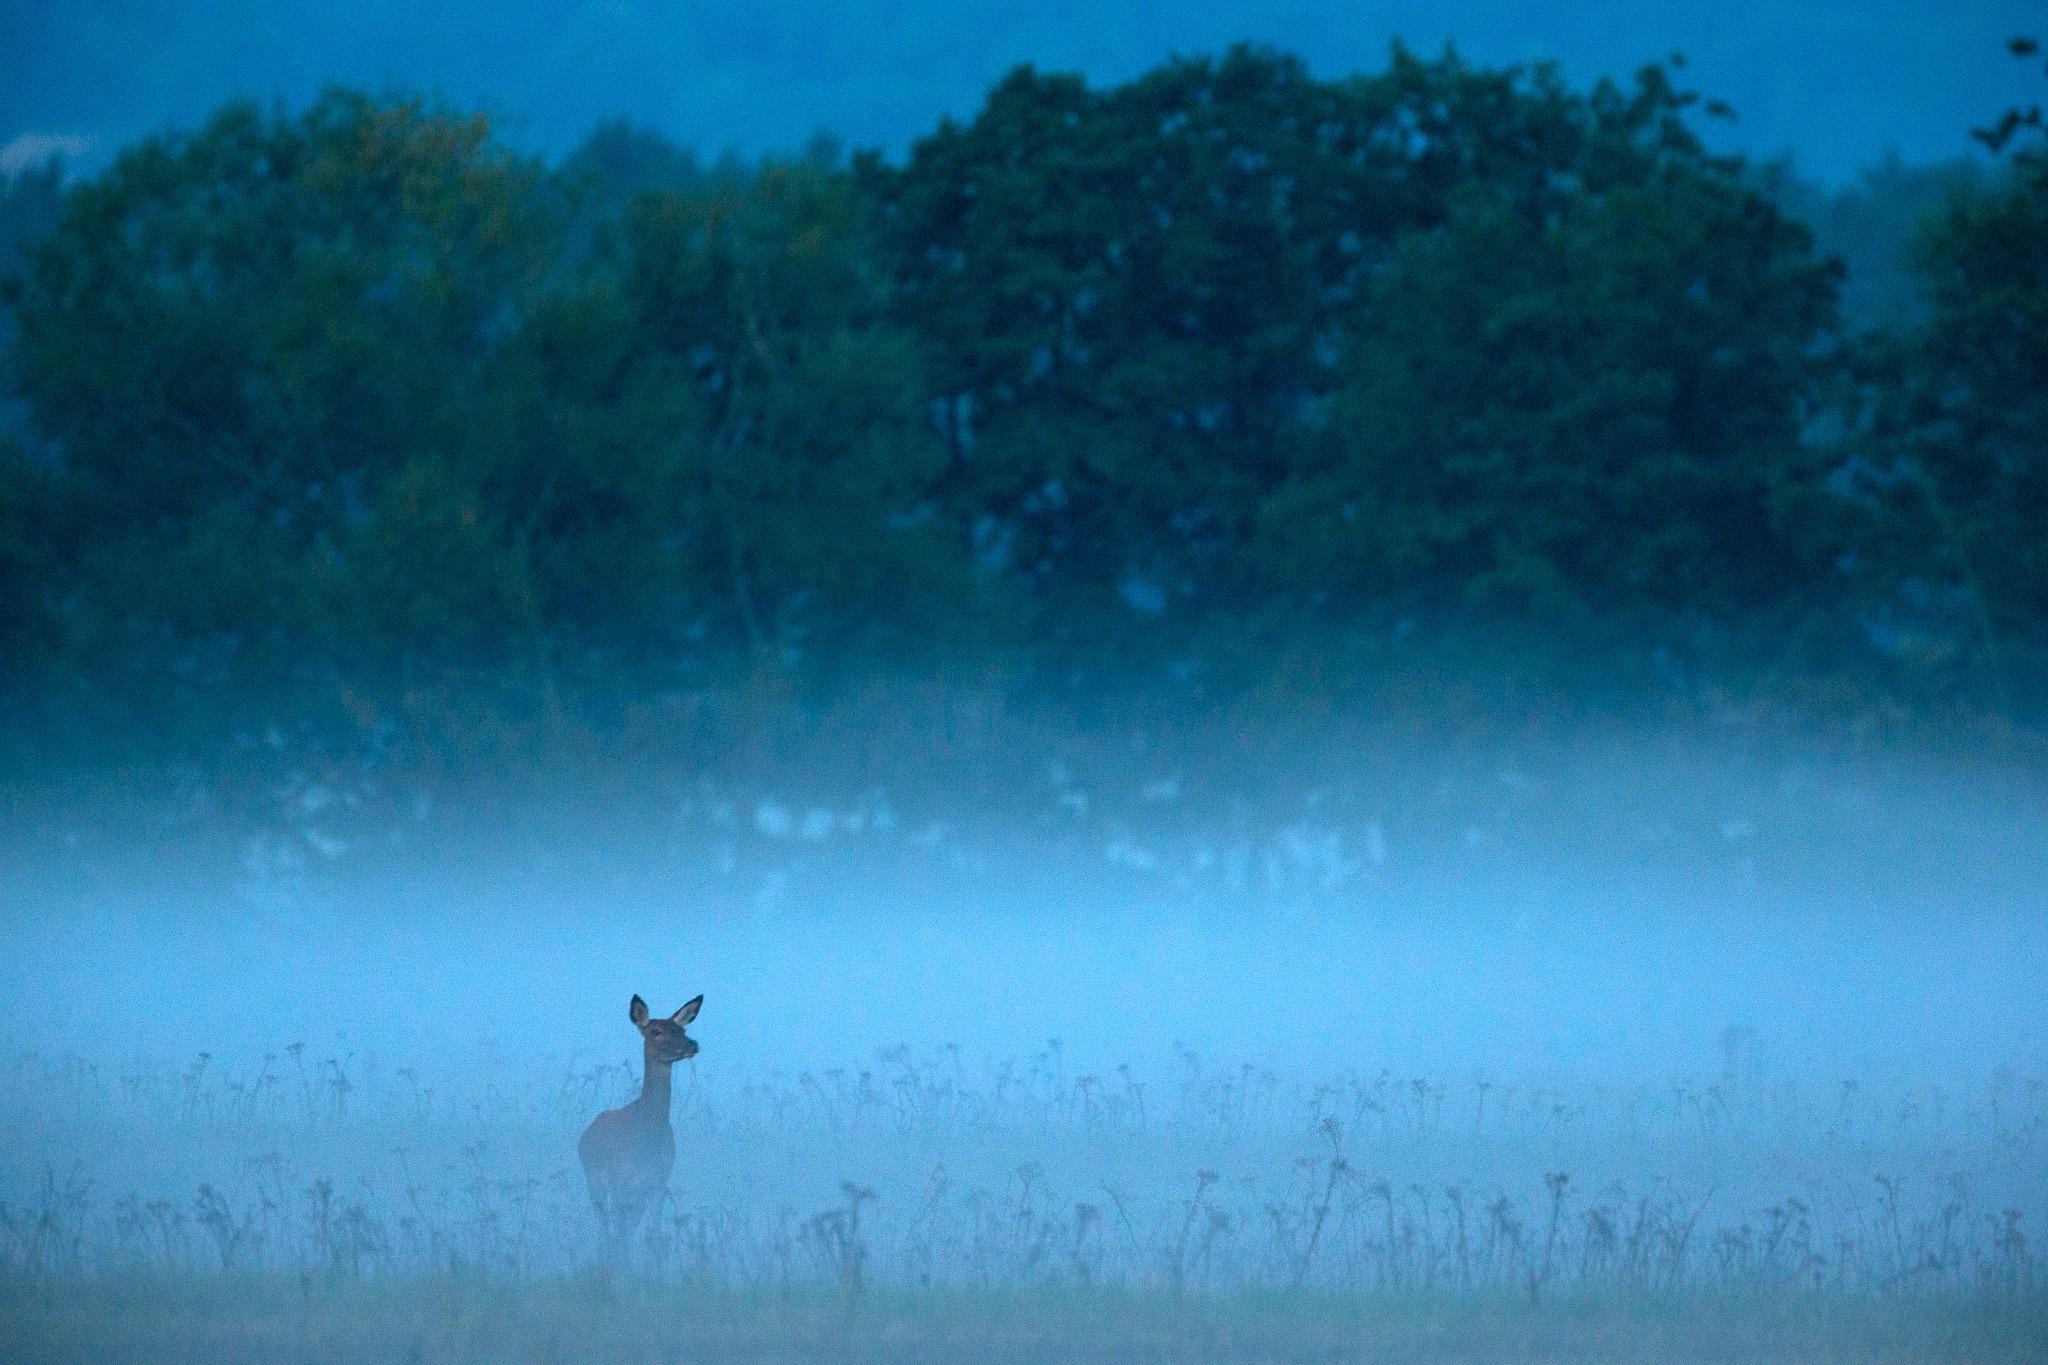 Morning mist by Håkan Liljenberg